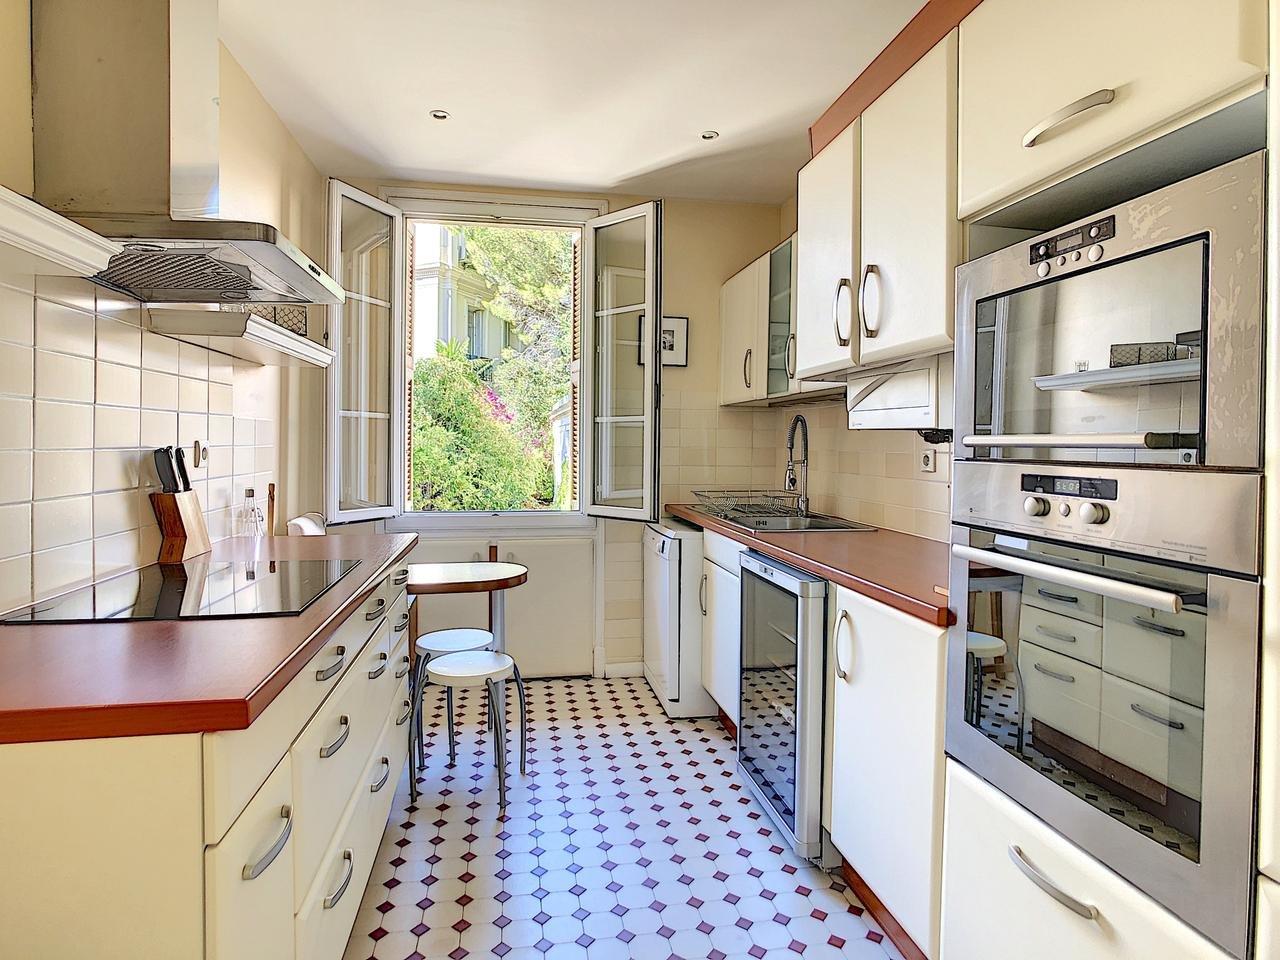 Vente appartement 96 m²